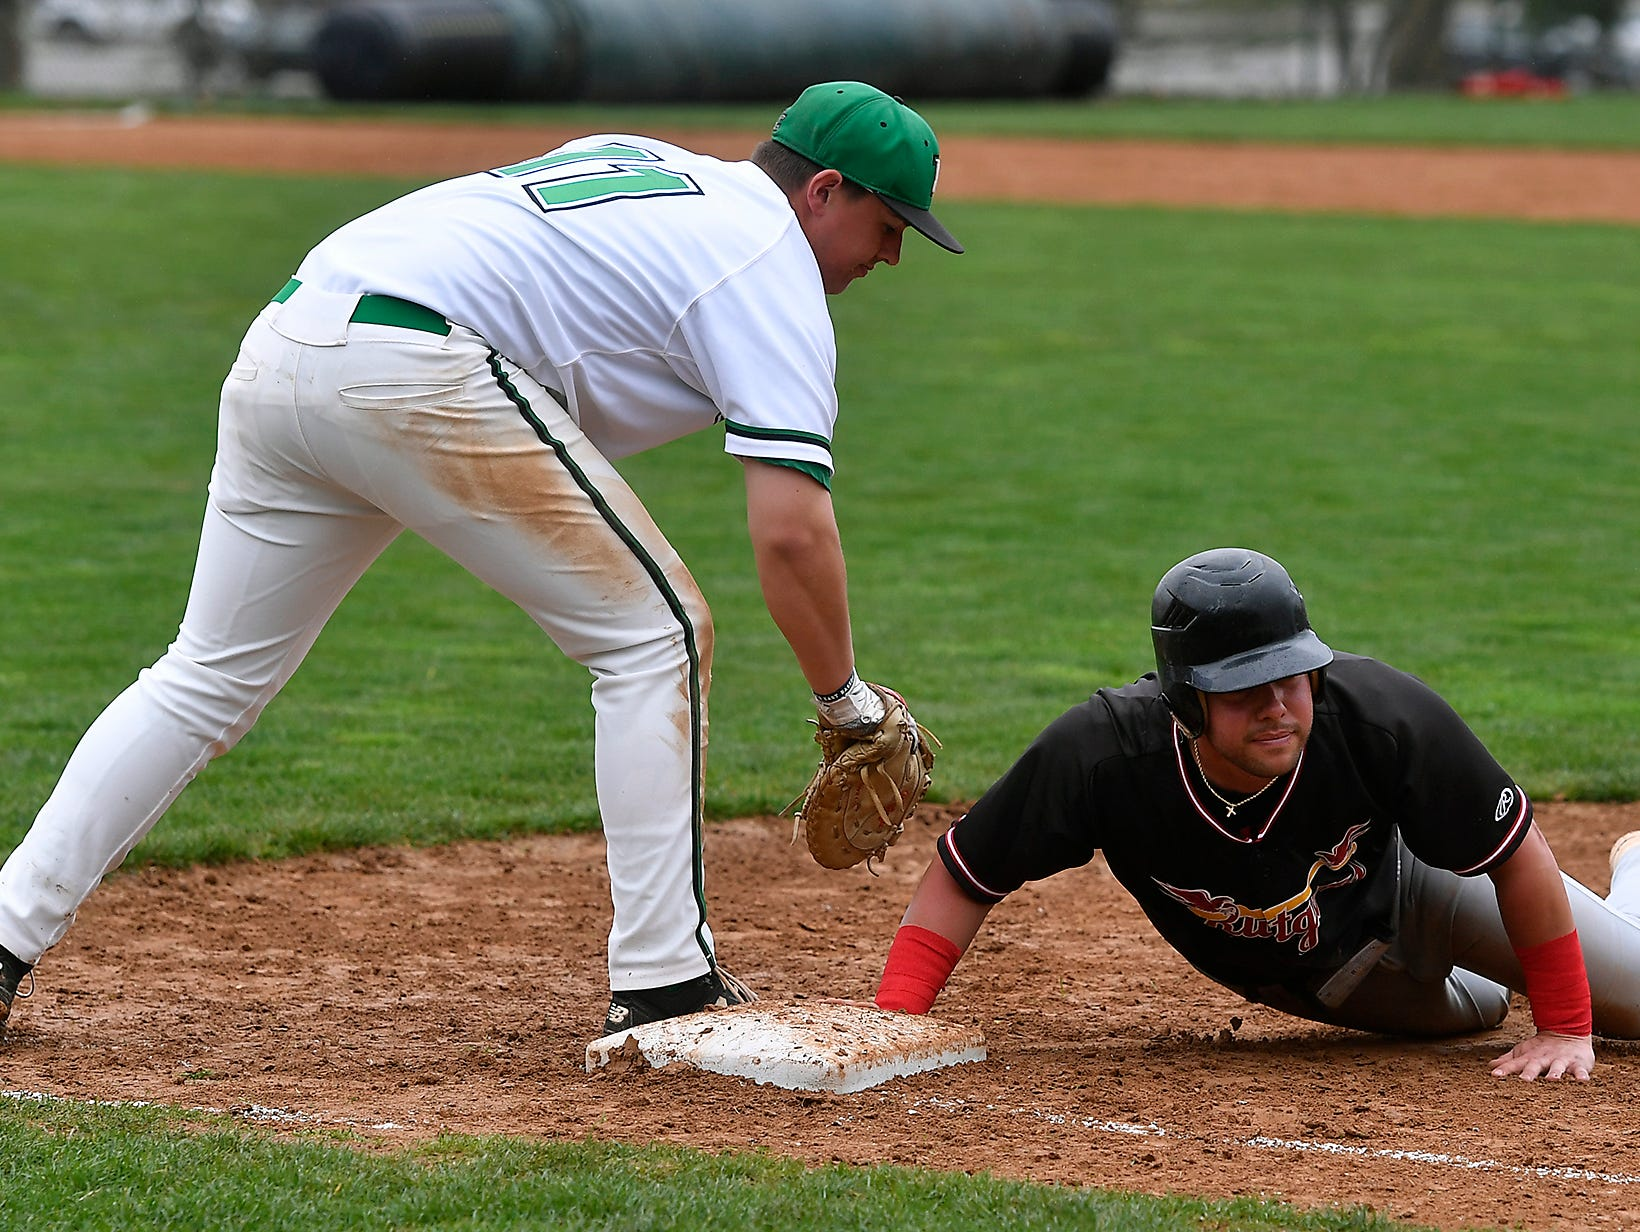 York College hosts Rudgers Camden in baseball, Sunday, April 14, 2019.John A. Pavoncello photo